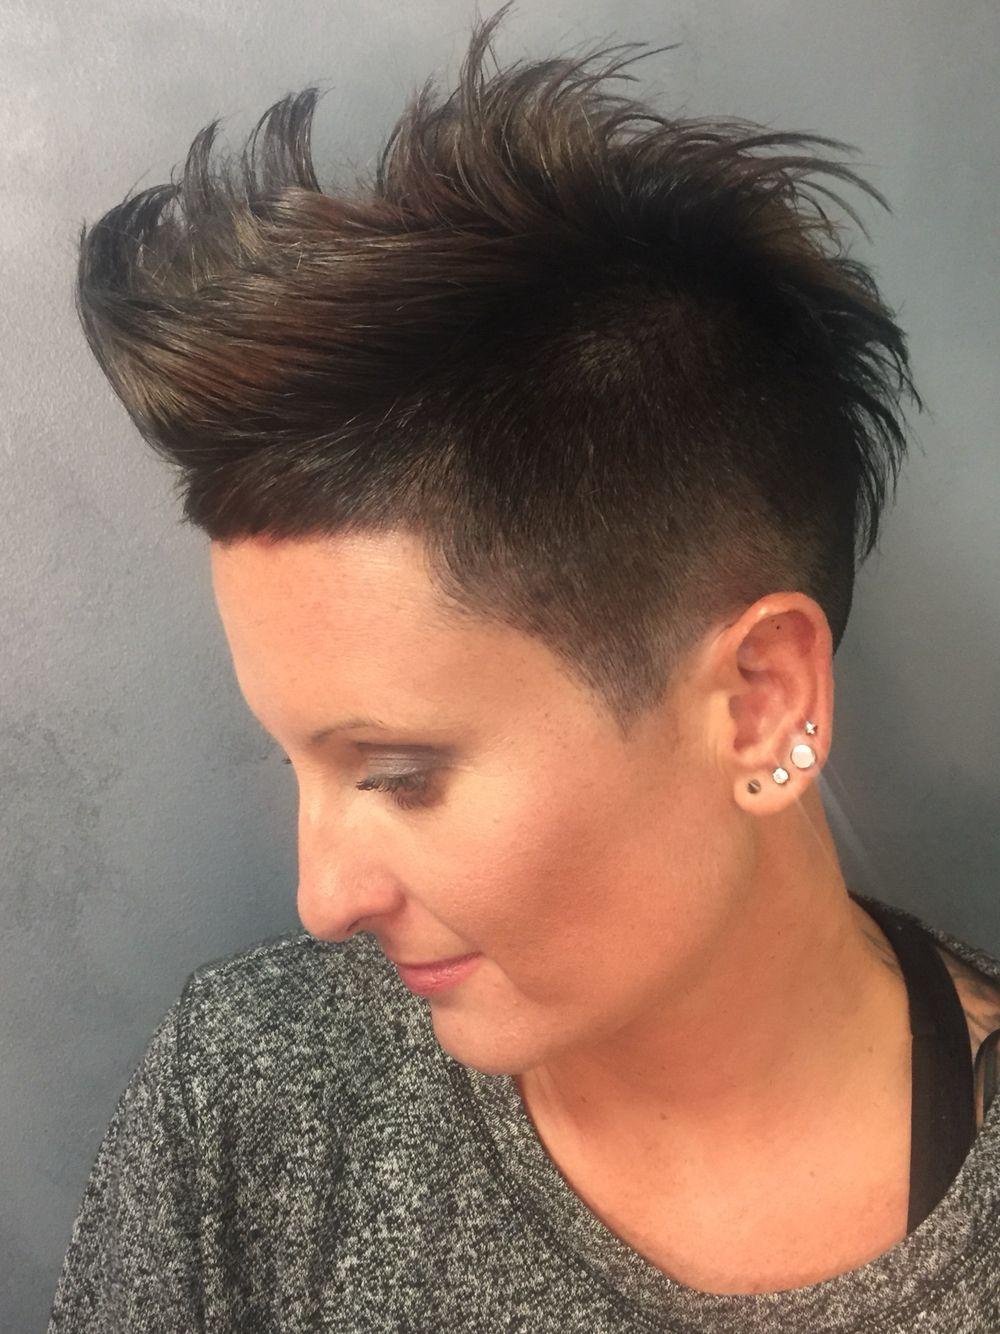 Womens Short Razor Undercut Short Haircut Hair Done By PattyP - Razor haircut